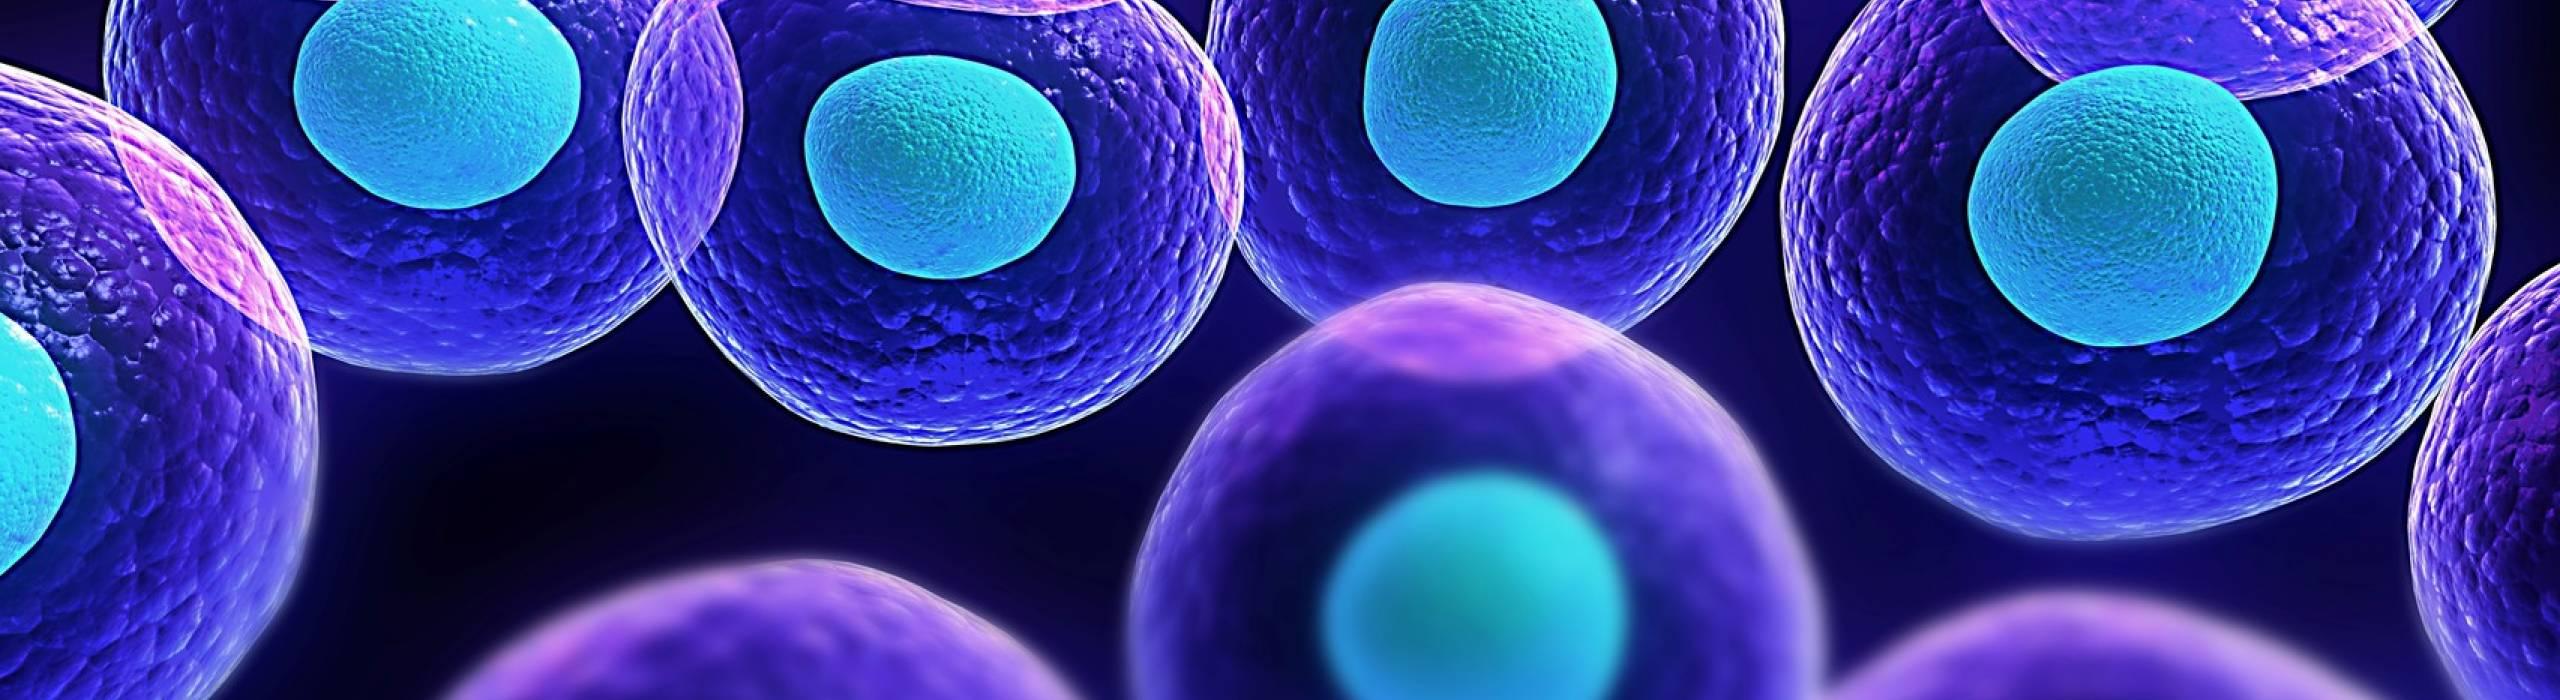 biology stock illustration